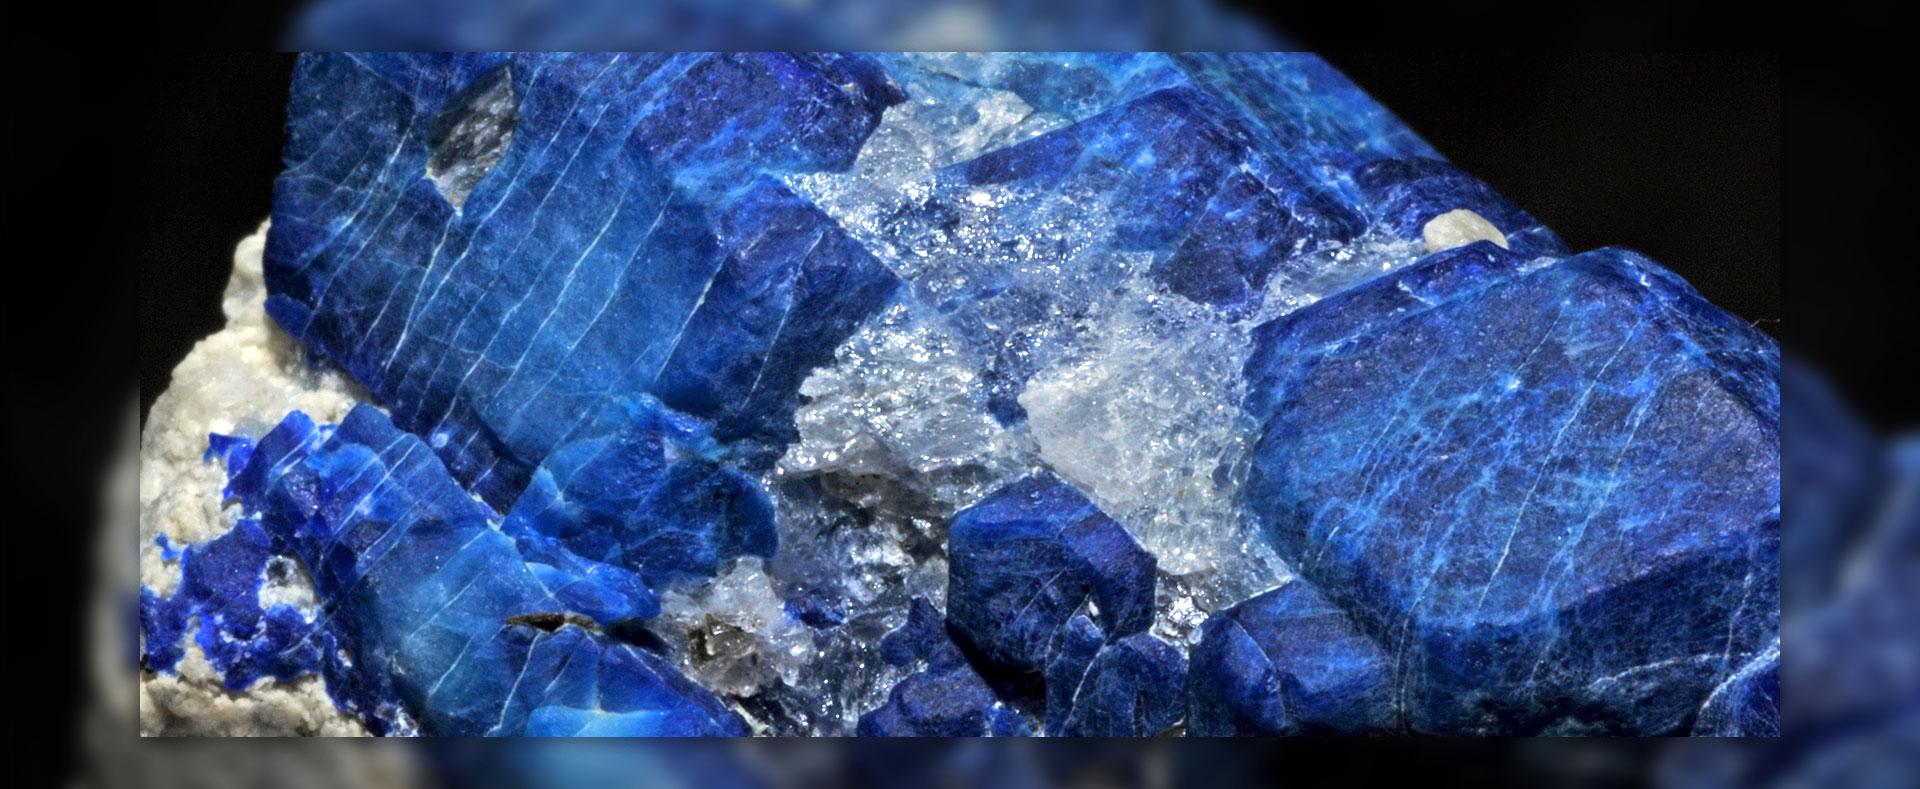 Bijoux Pierre Bleue, Nom pierre semi-précieuse Bleue, Bijoux Femme Bleue, Pierre Précieuse Bleue, Pierre Semi-Précieuse Bleue, pierre fine Bleue